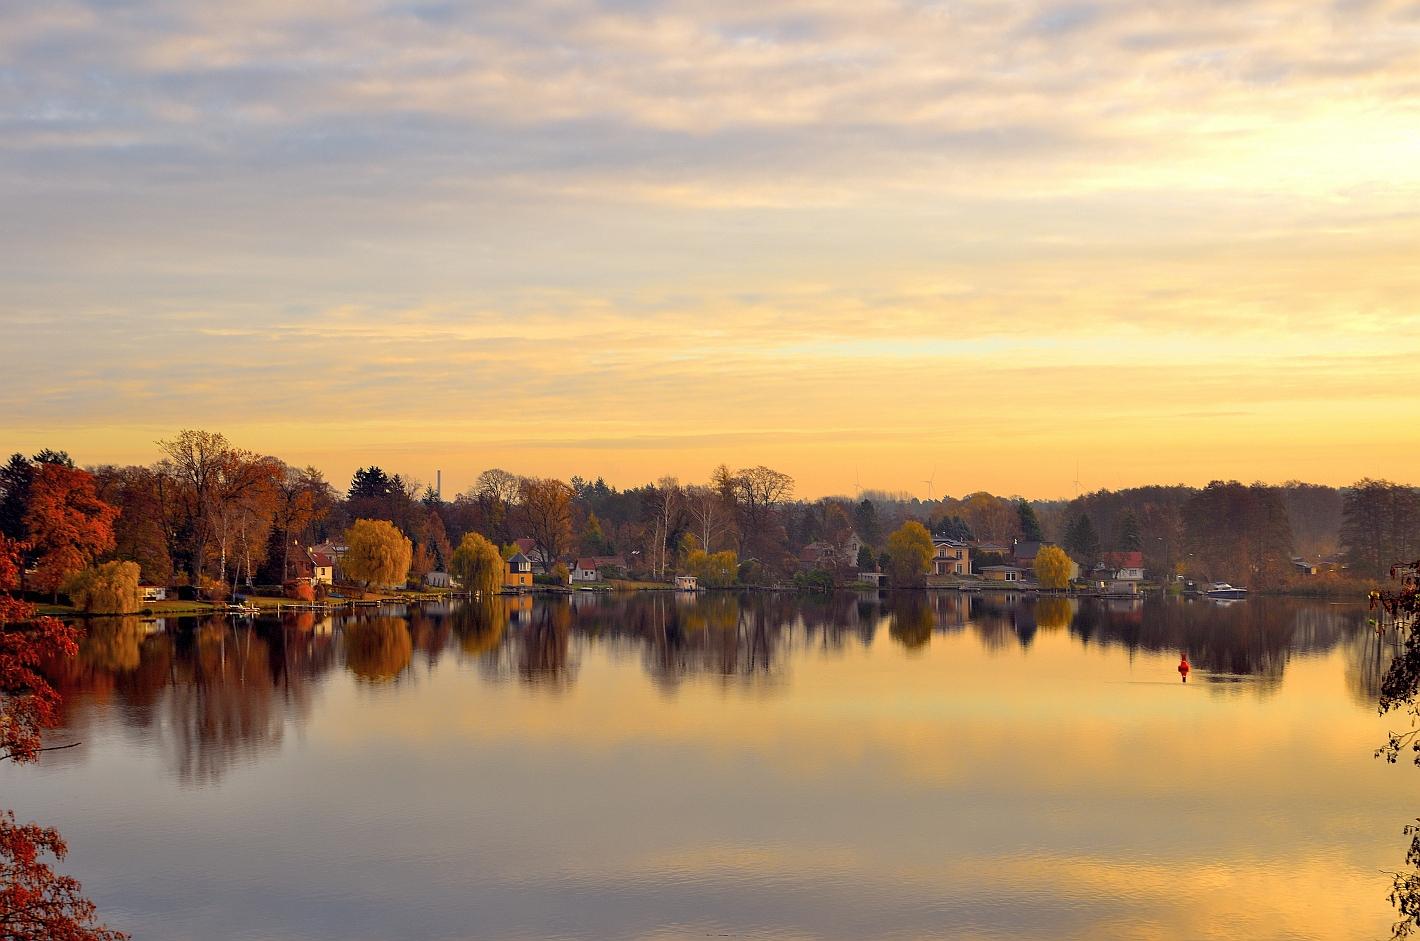 Spiegeltag, Goldener See, Golden Sea, Lago del Oro